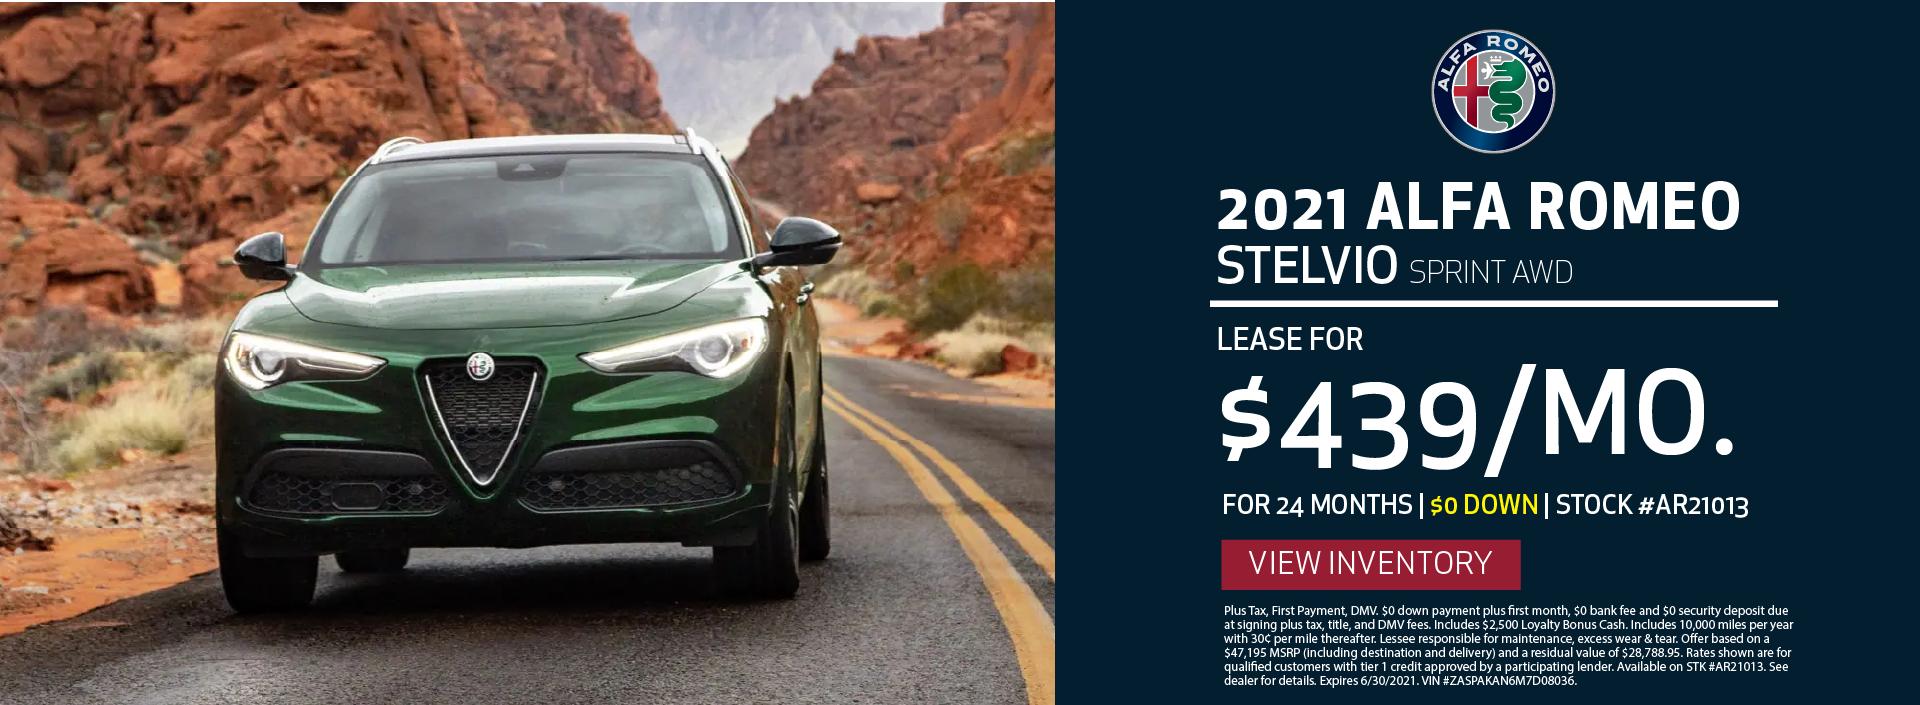 Manhattan Alfa Romeo – 2021 Stelvio Sprint – June 2021